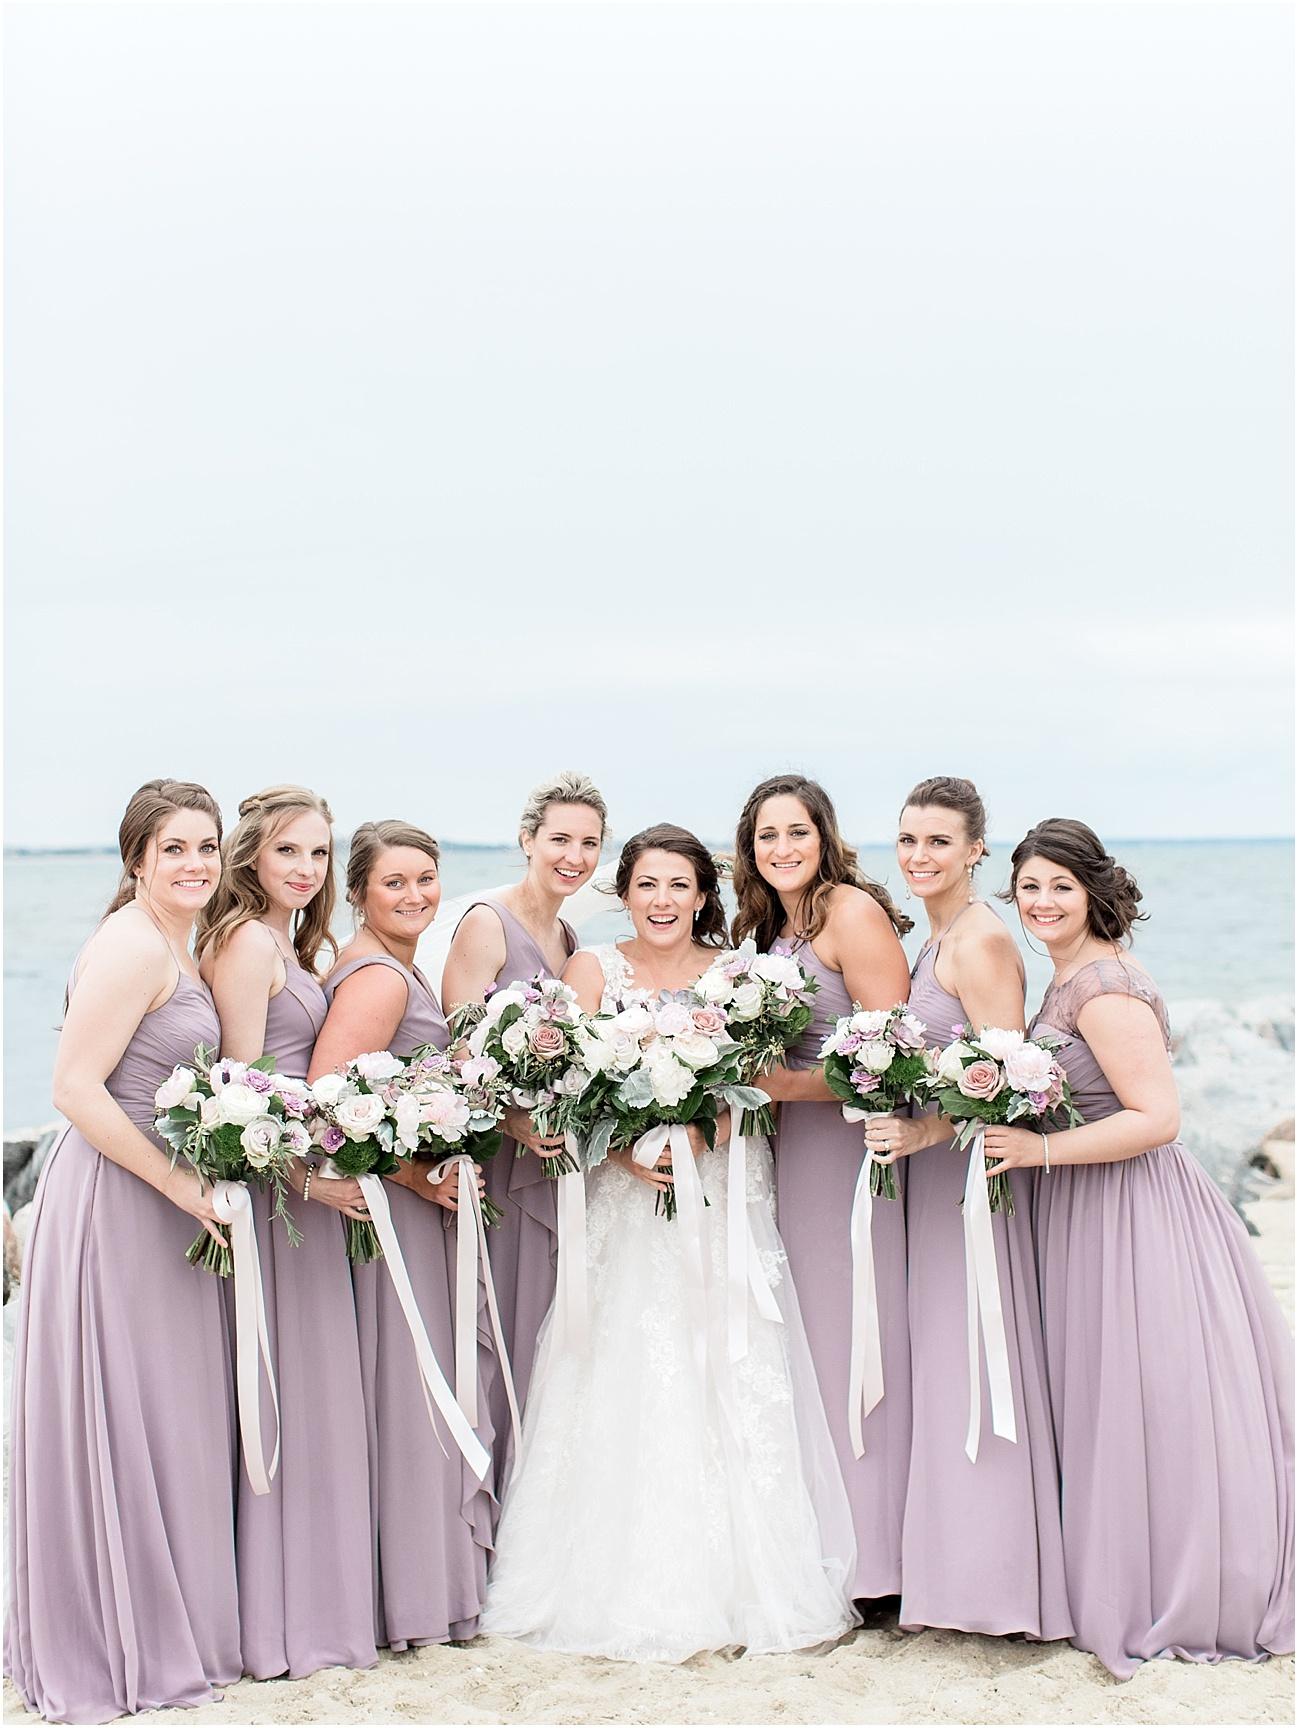 courtney_kurt_cape_cod_popponessett_inn_dowses_beach_boston_wedding_meredith_jane_photography_photo_0038.jpg